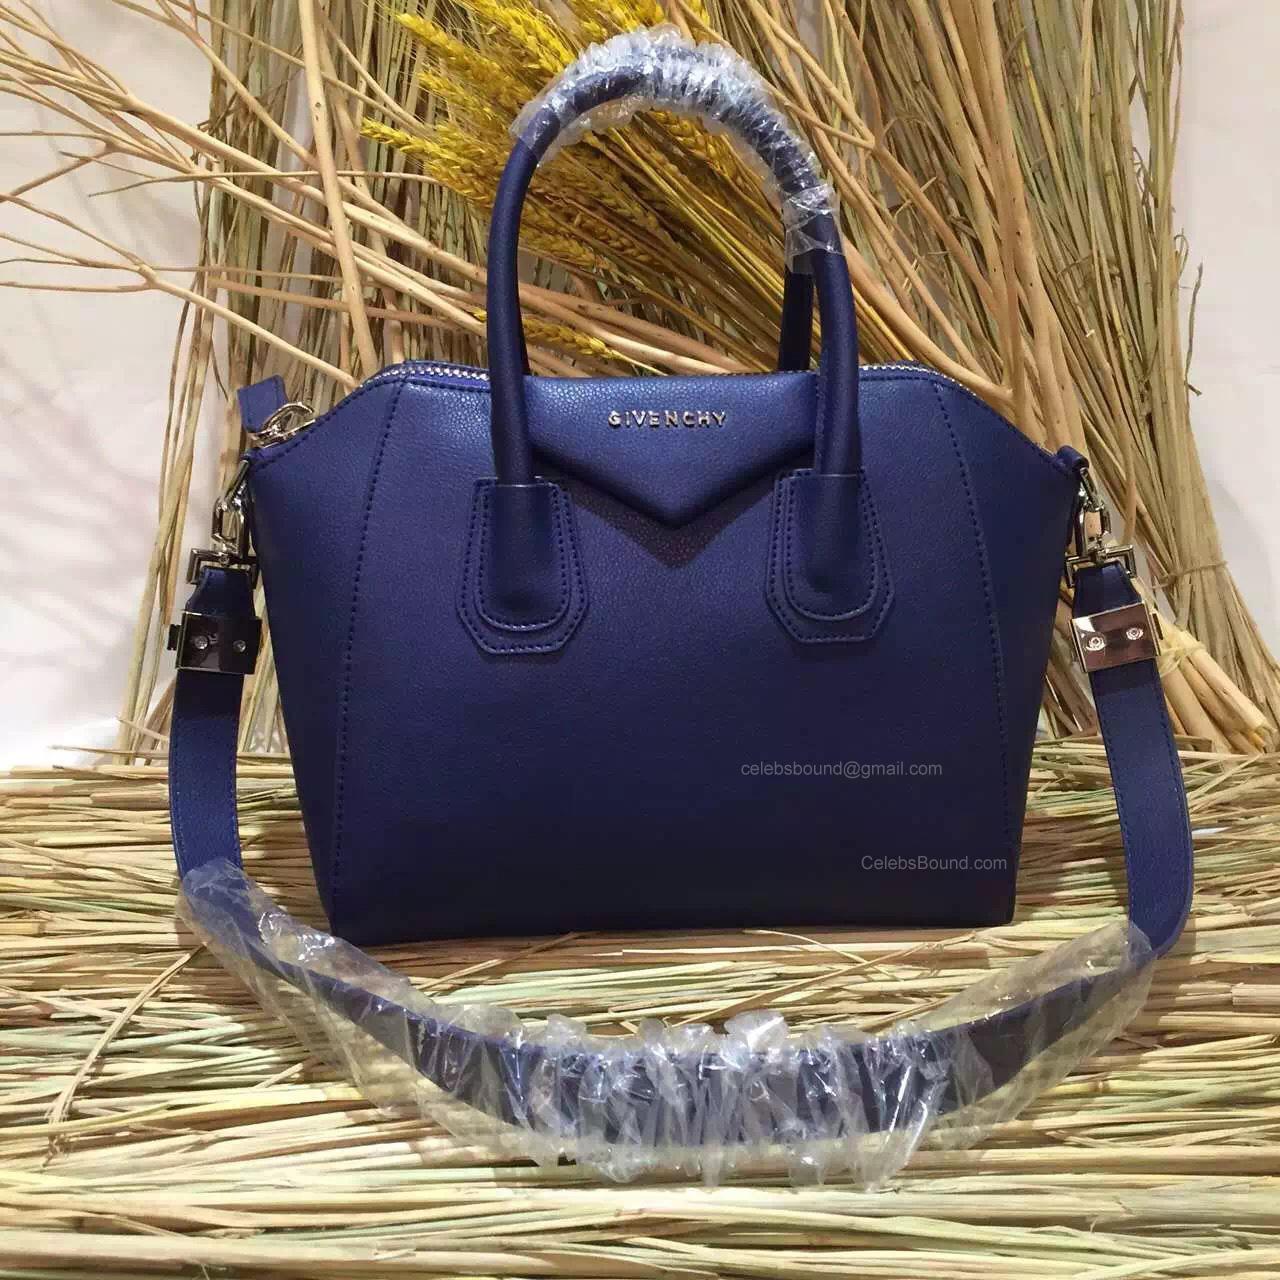 e59a1eea41b9 Givenchy Small Antigona Bag in Deep Blue Goatskin 285173M